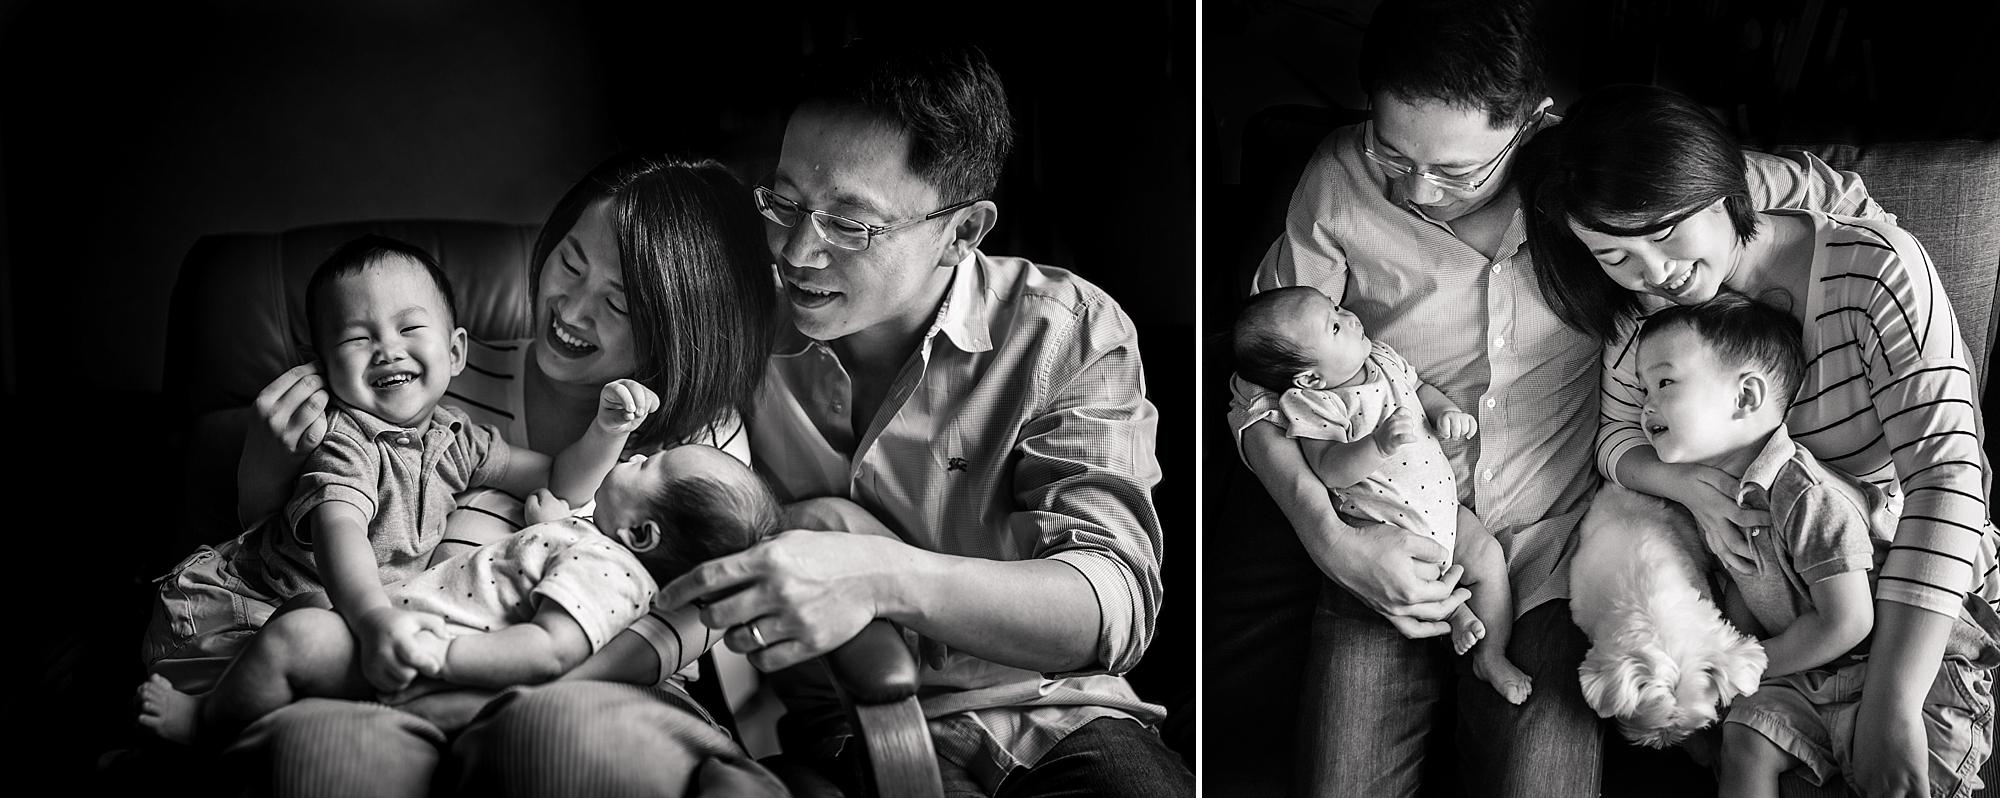 In_Home_Newborn_Family_Photos_Portland_Hunnicutt_Photography_0011